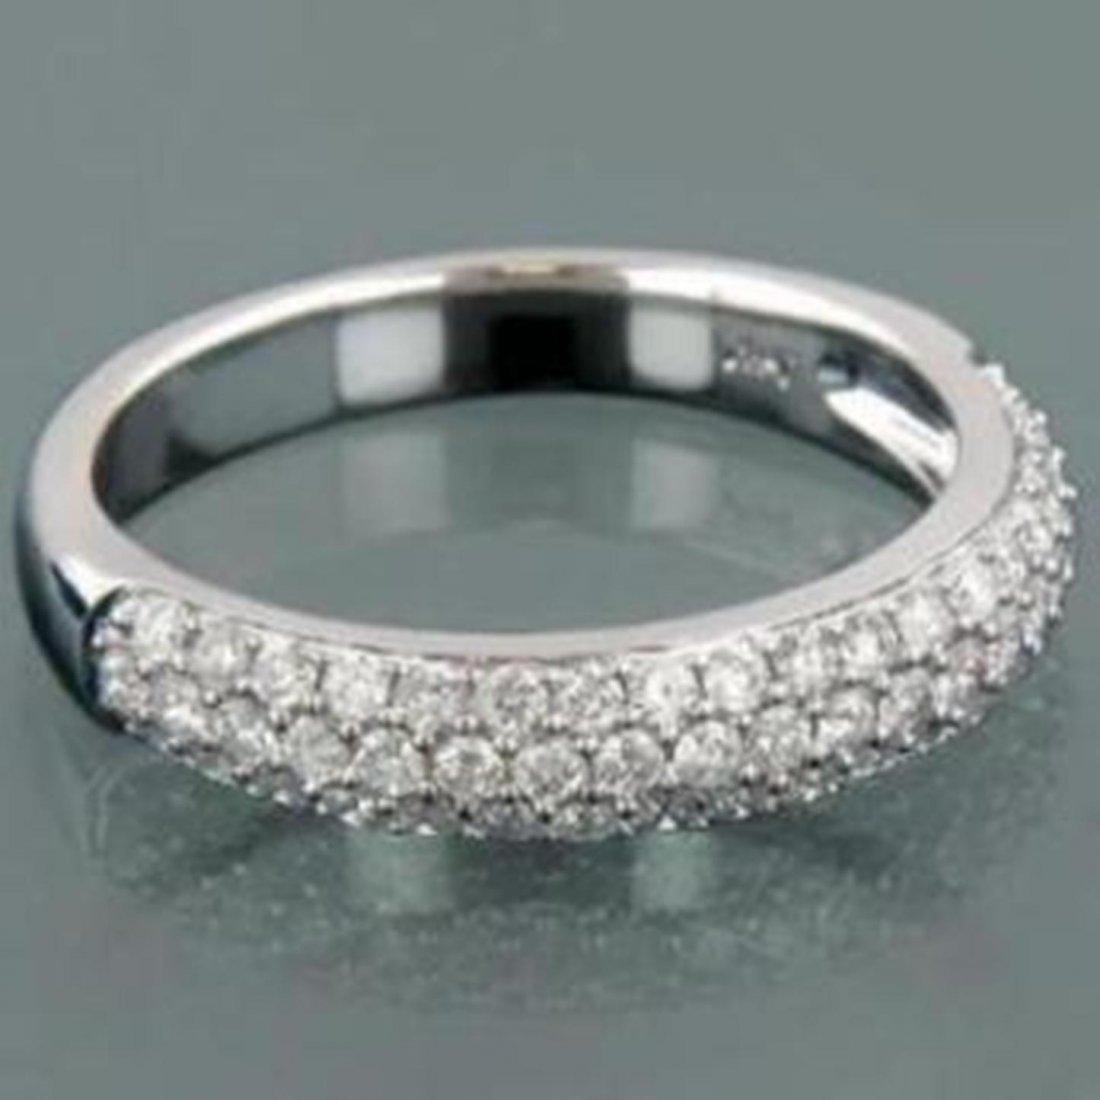 8: Stunning Woman's Diamond Ring 1.17 carat 14k W/G